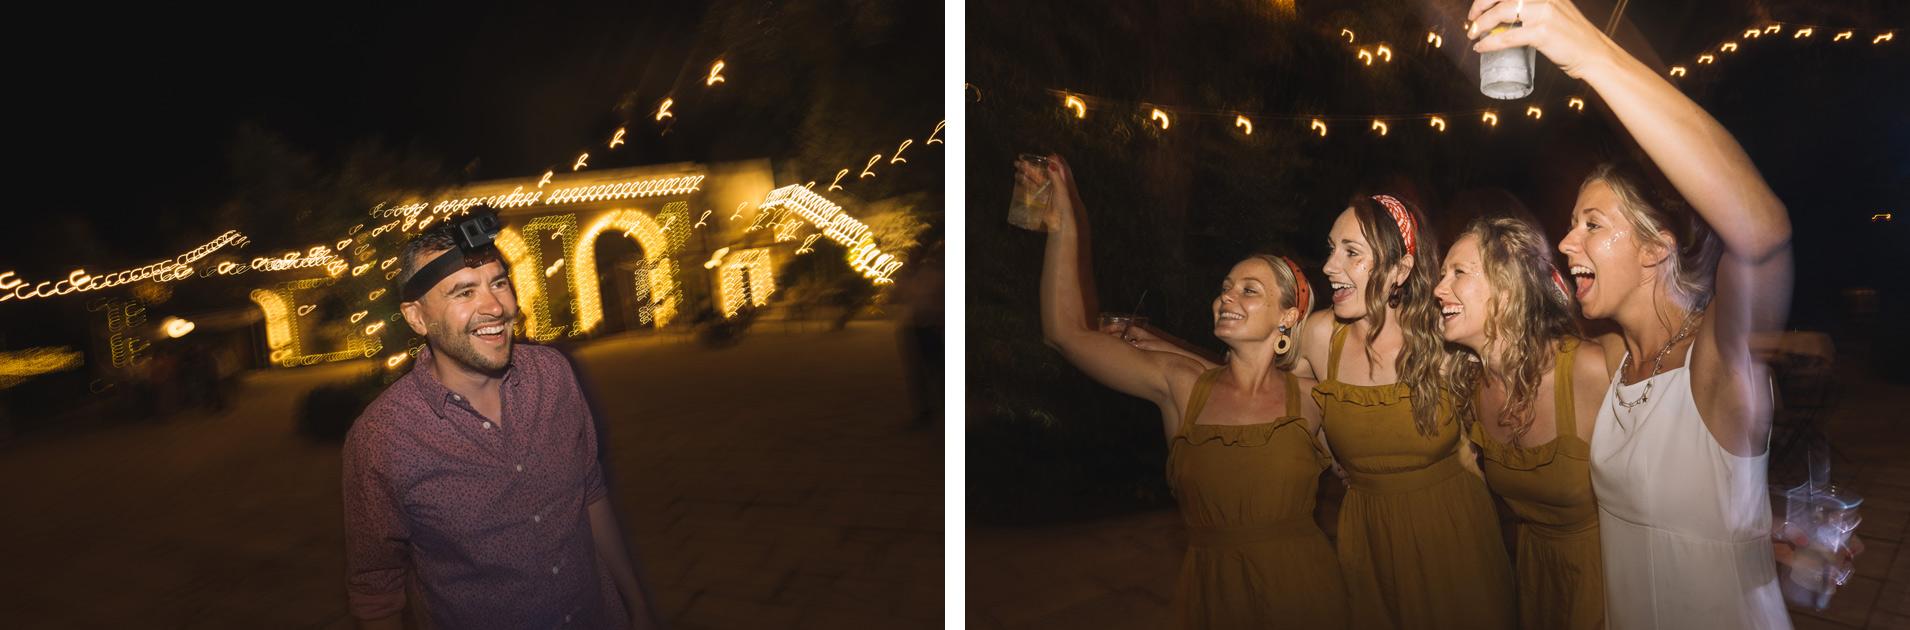 Puglia Wedding Dance Venue